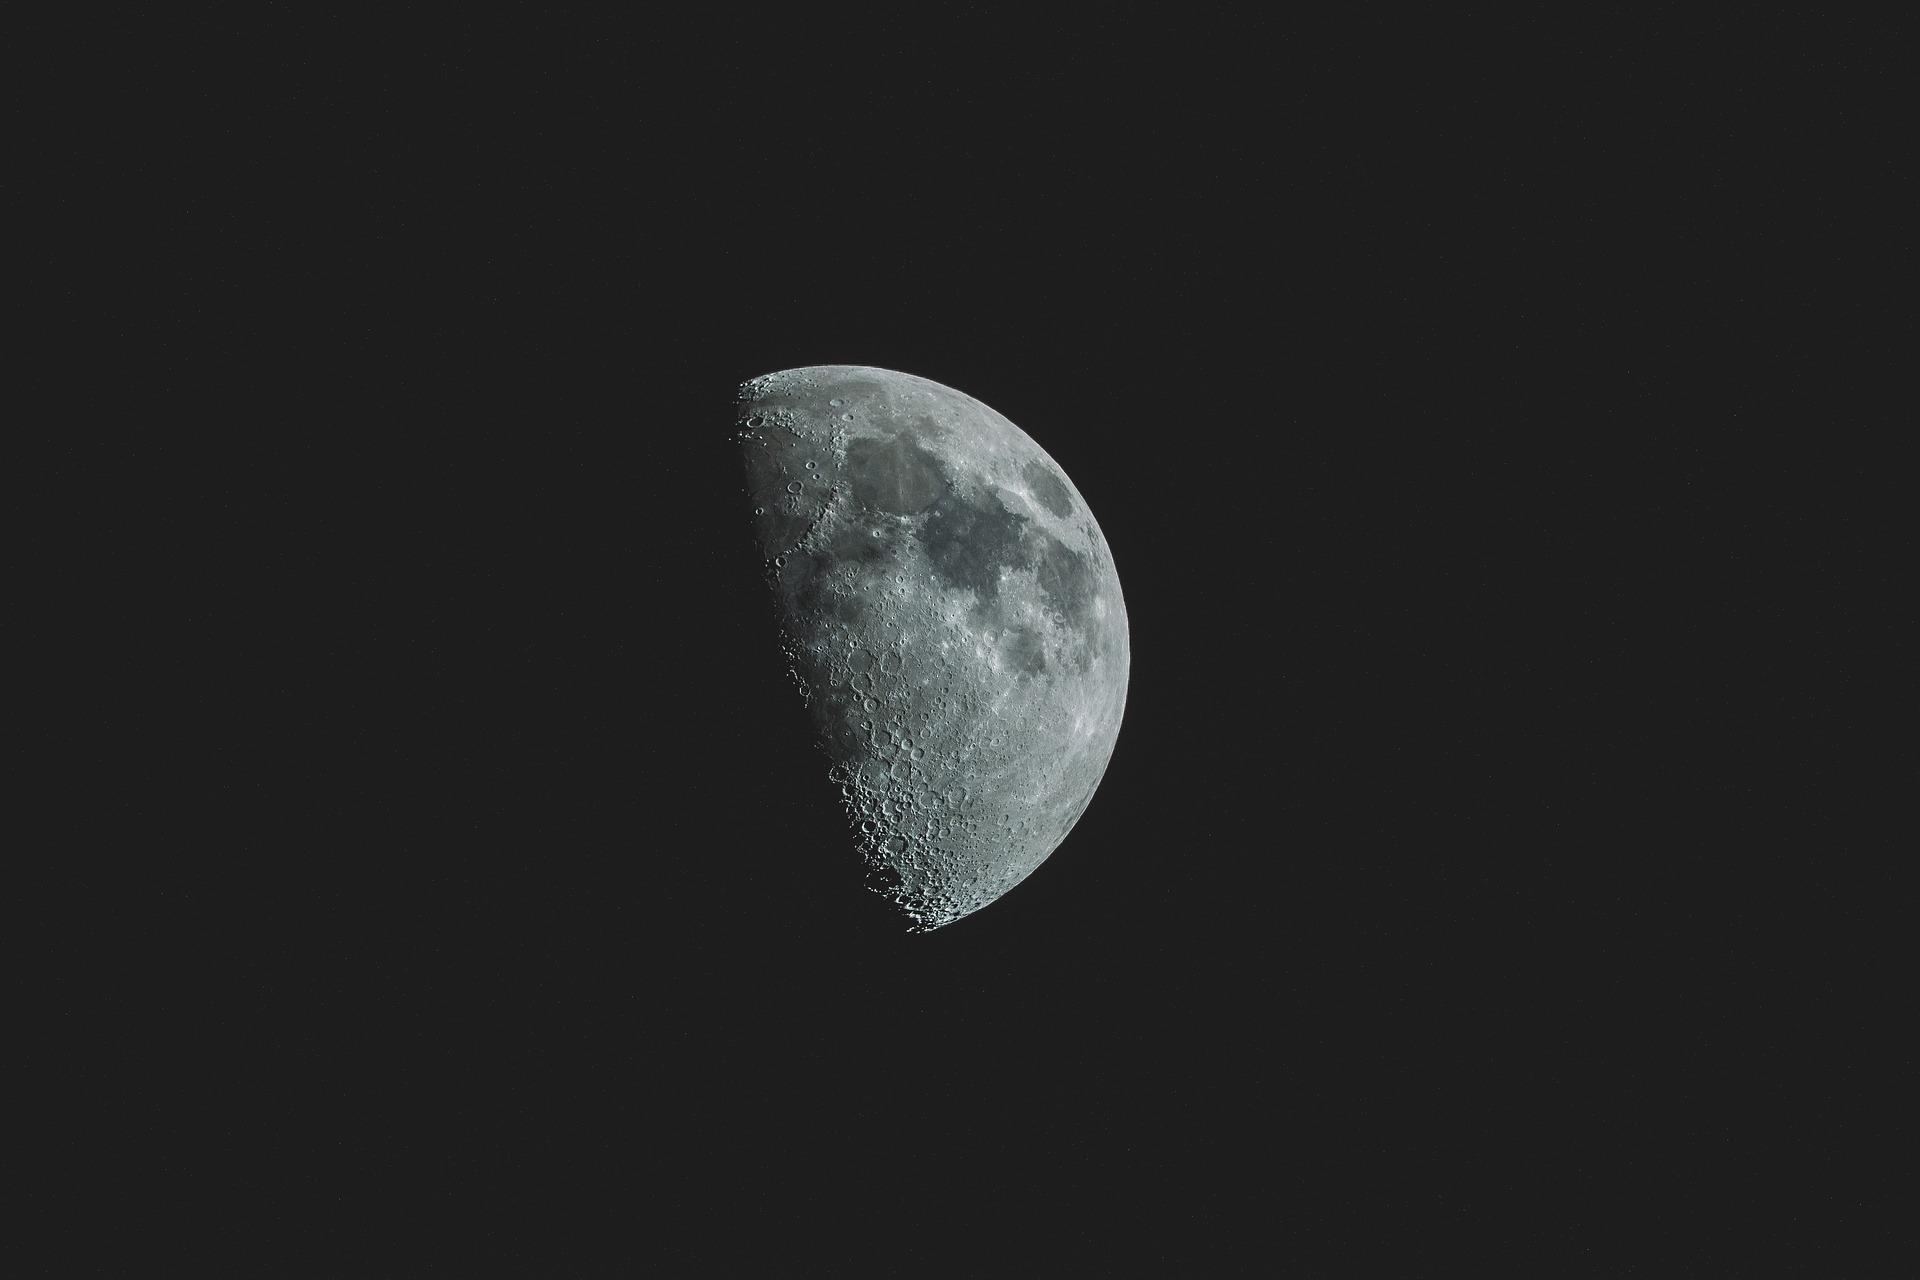 crater-1866821_1920